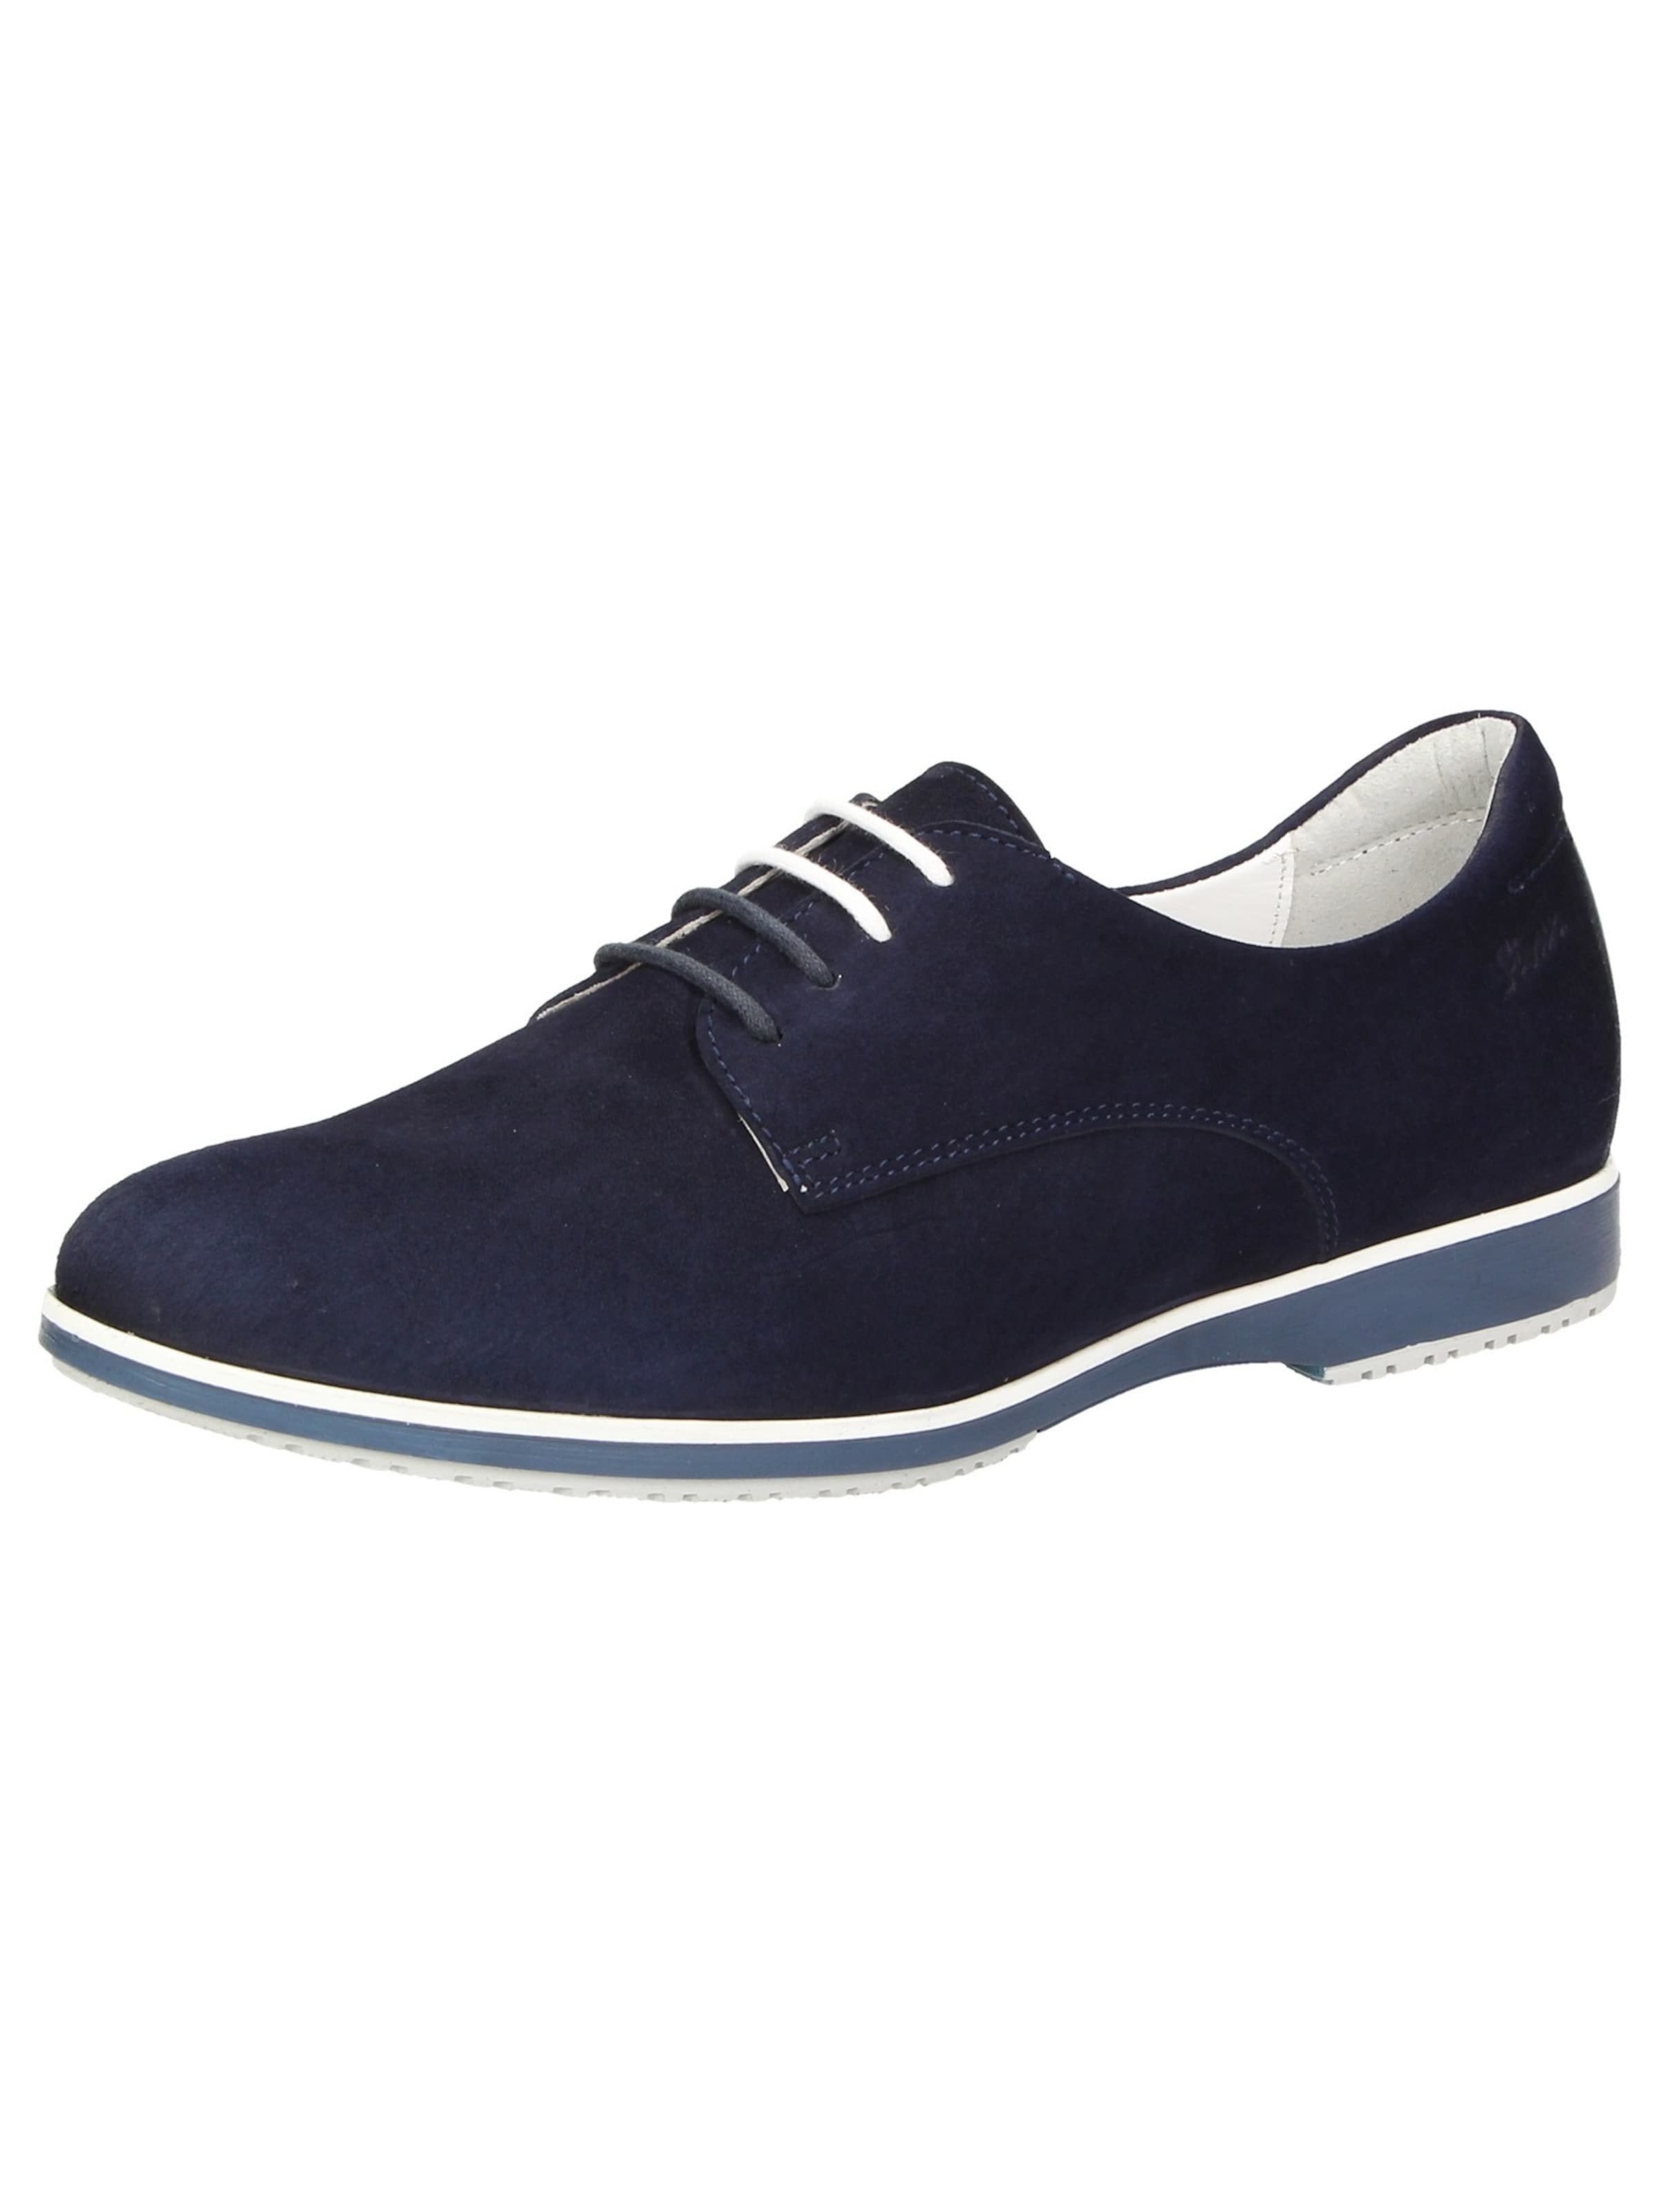 Haltbare Mode billige Schuhe SIOUX   Schnürschuh 'Darina' Schuhe Gut getragene Schuhe